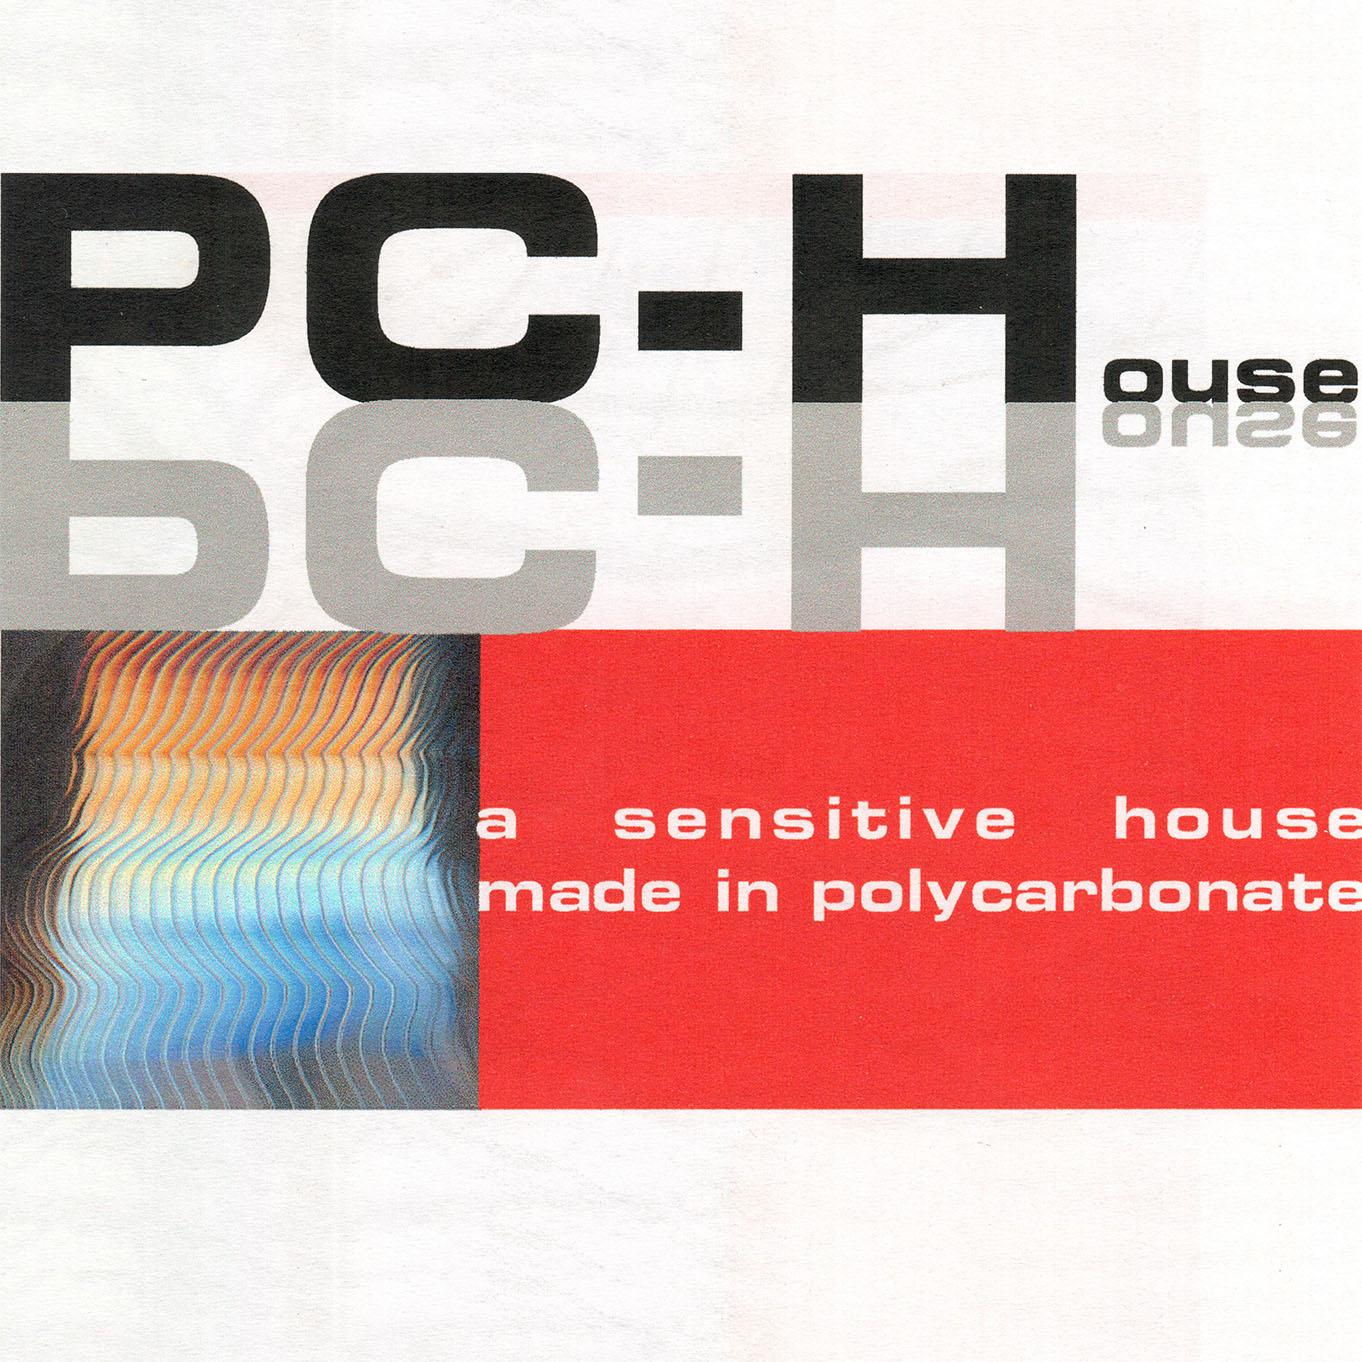 PC_House